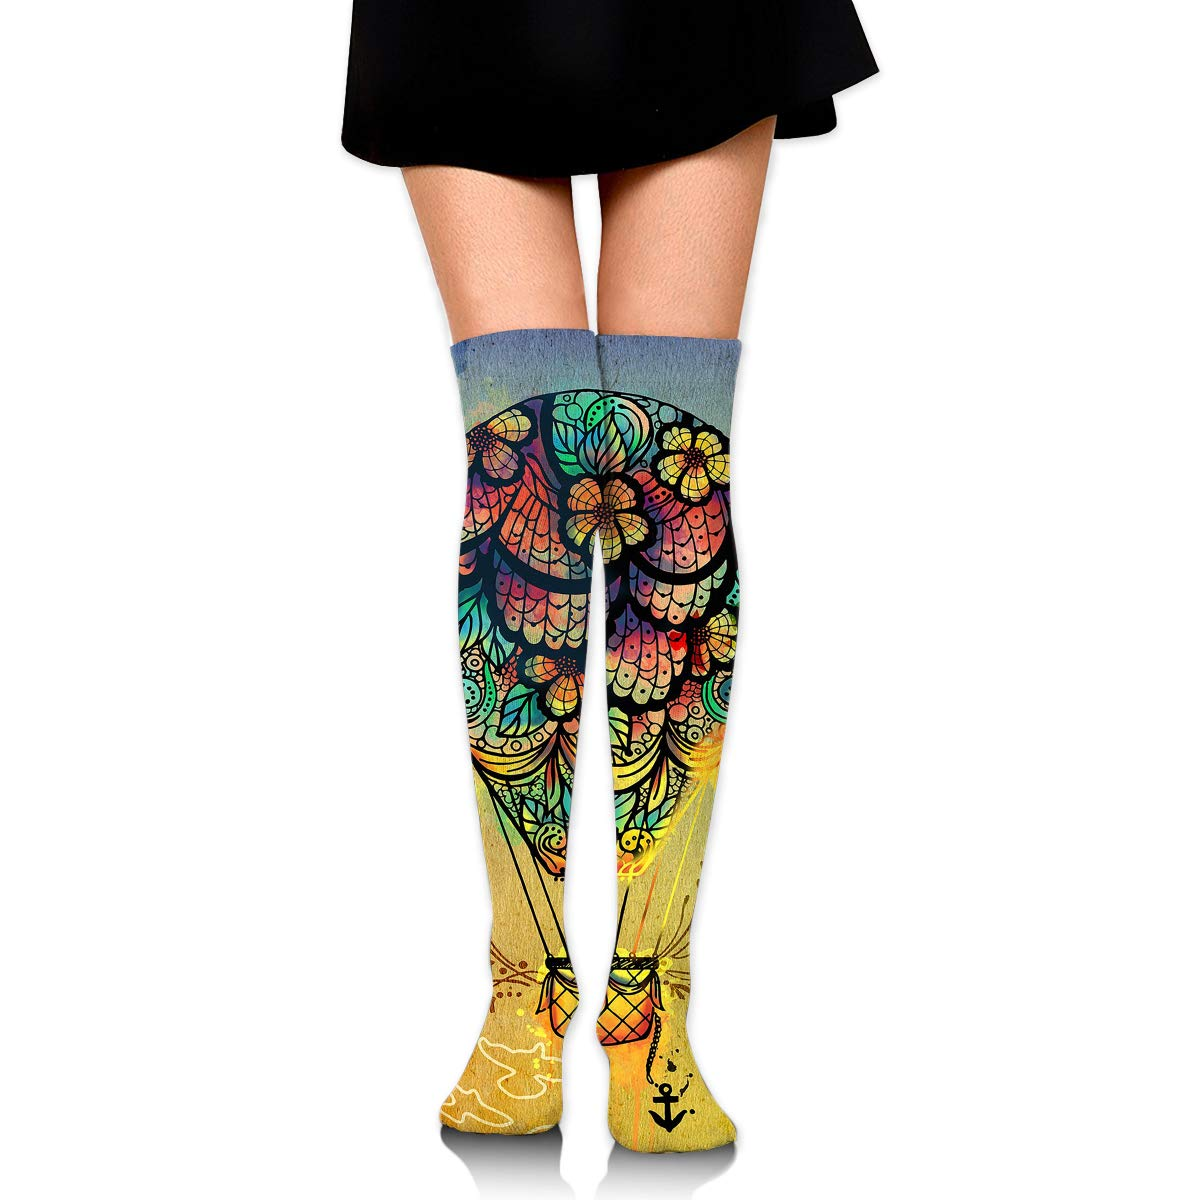 High Elasticity Girl Cotton Knee High Socks Uniform Hot Air Balloon Art Women Tube Socks